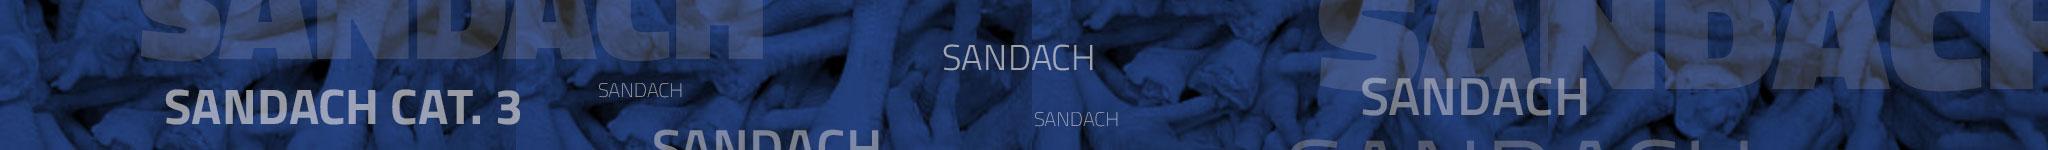 sandach